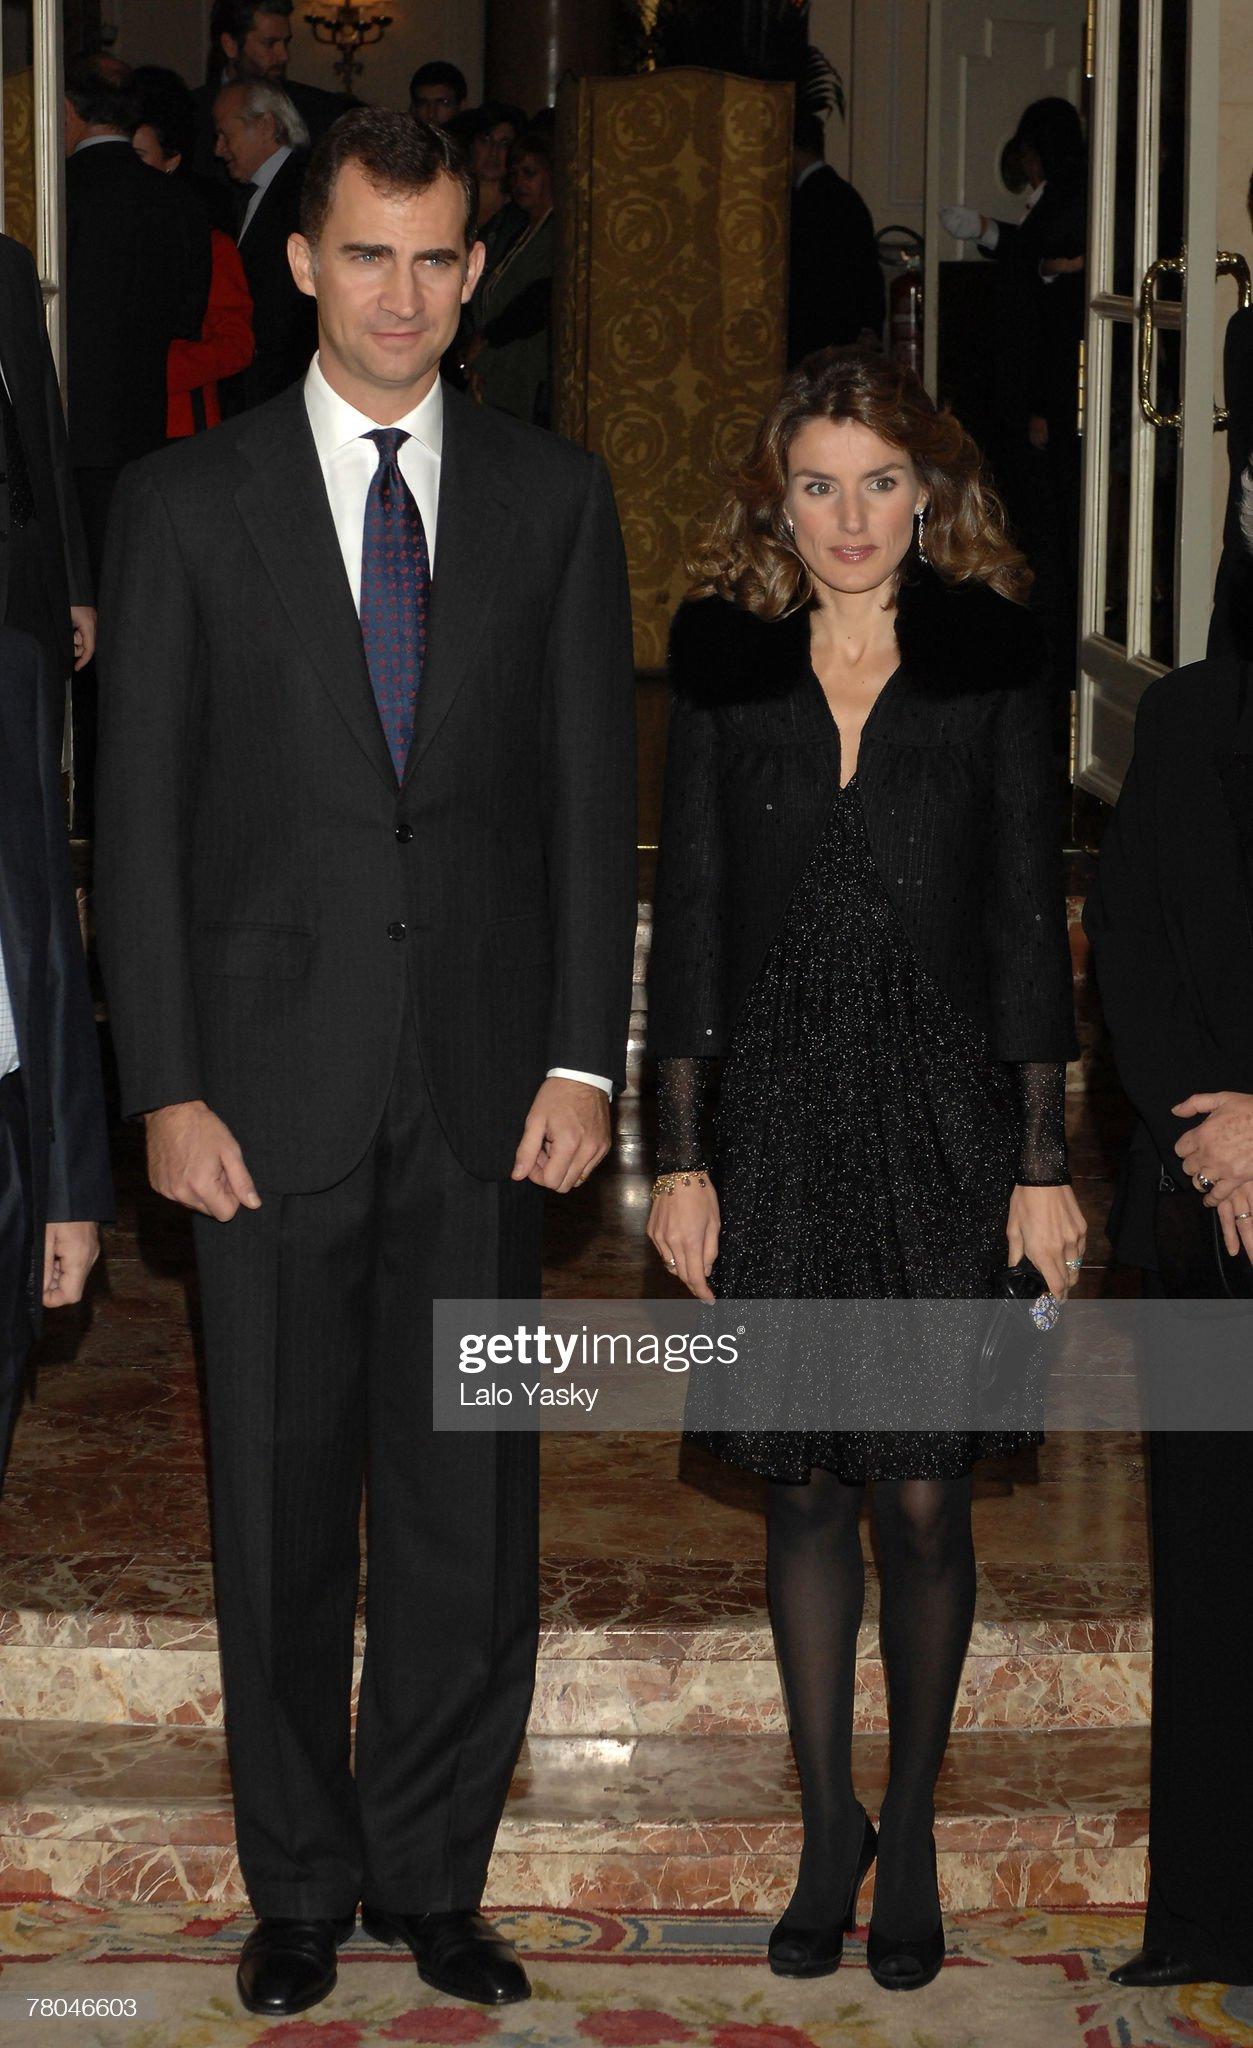 Вечерние наряды Королевы Летиции Prince Felipe and Princess Letizia Attend Journalism Award Dinner : News Photo